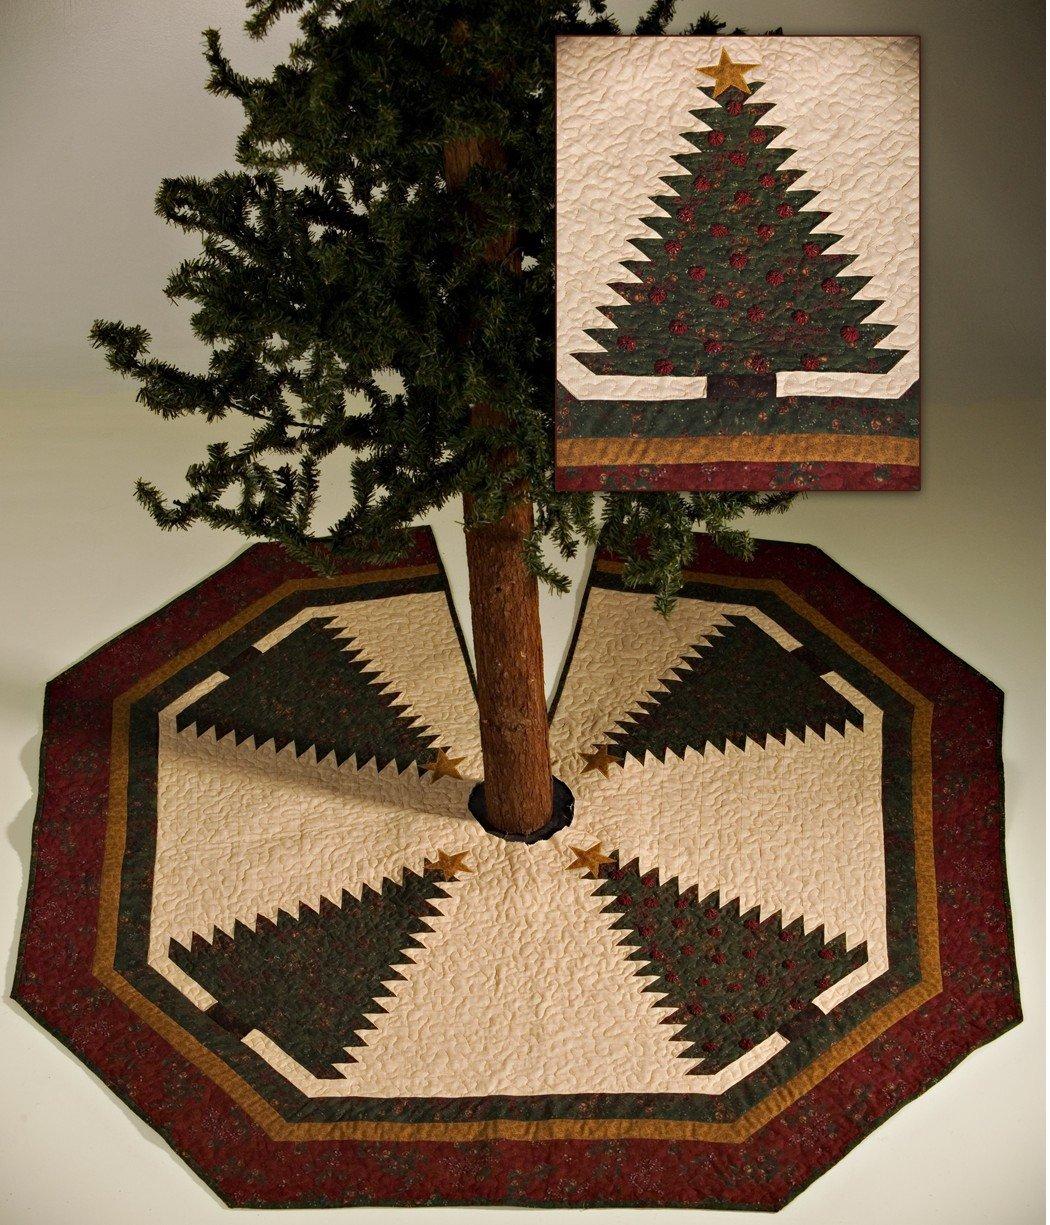 128 Tall Pines Tree Skirt